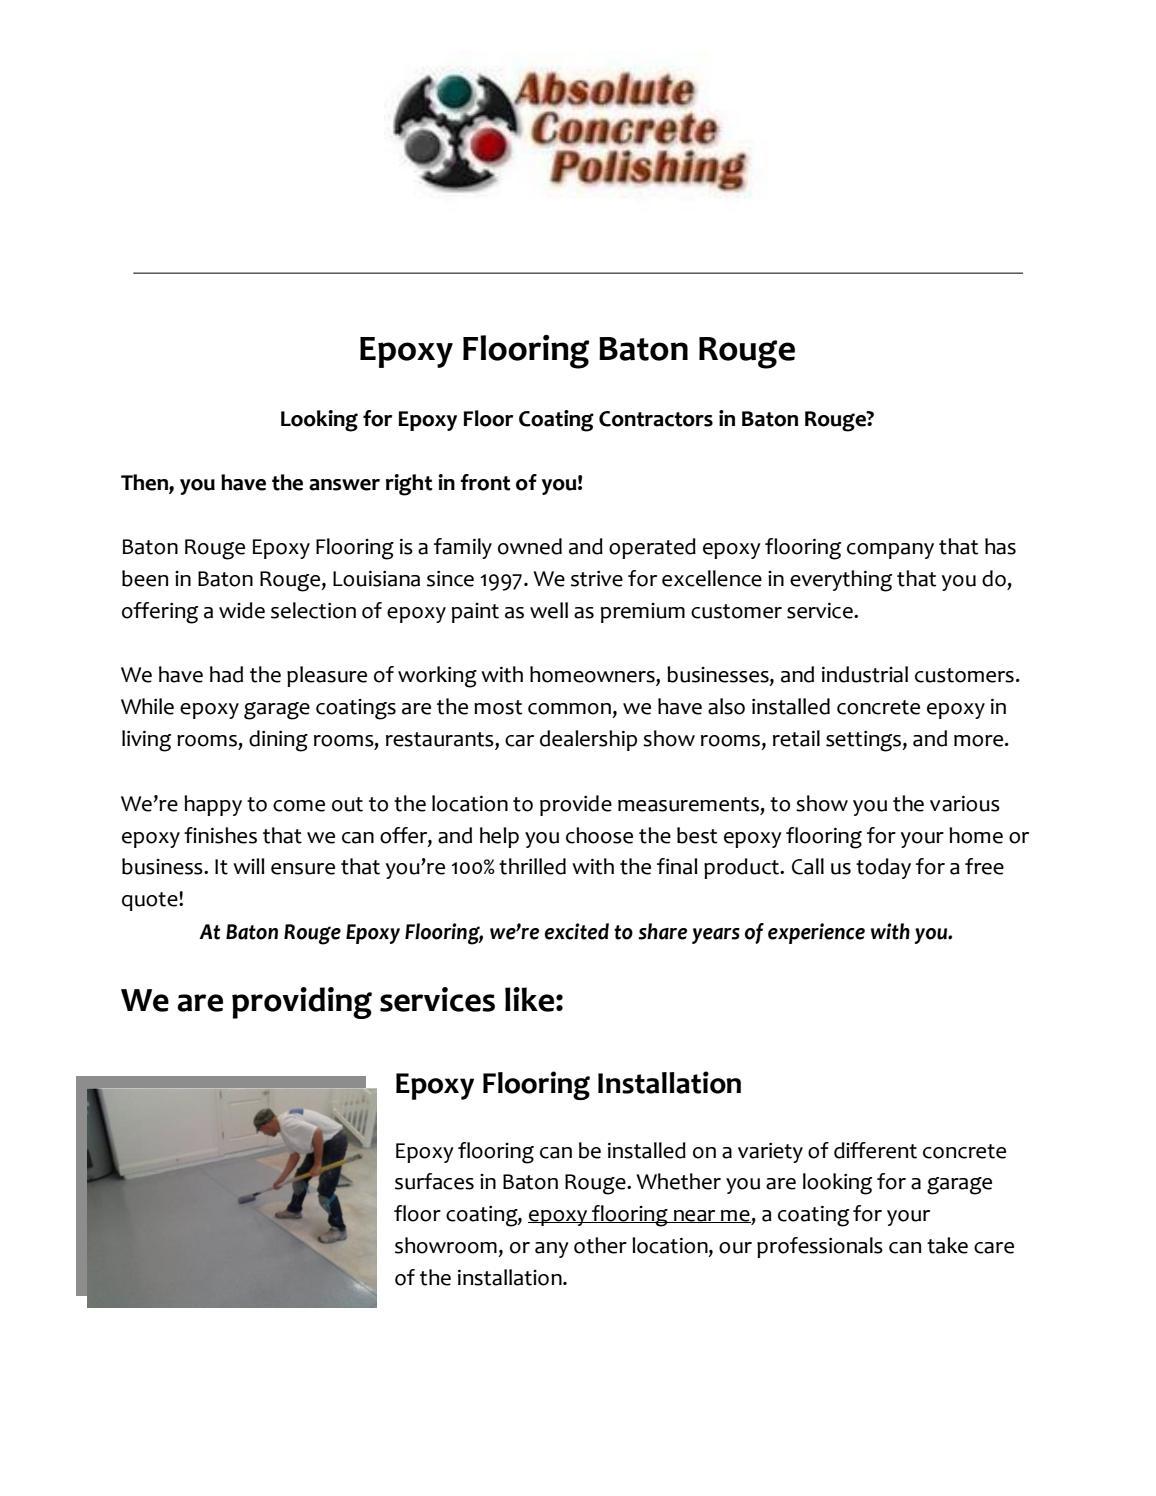 Epoxy Flooring Baton Rouge: You're trusted Epoxy Flooring